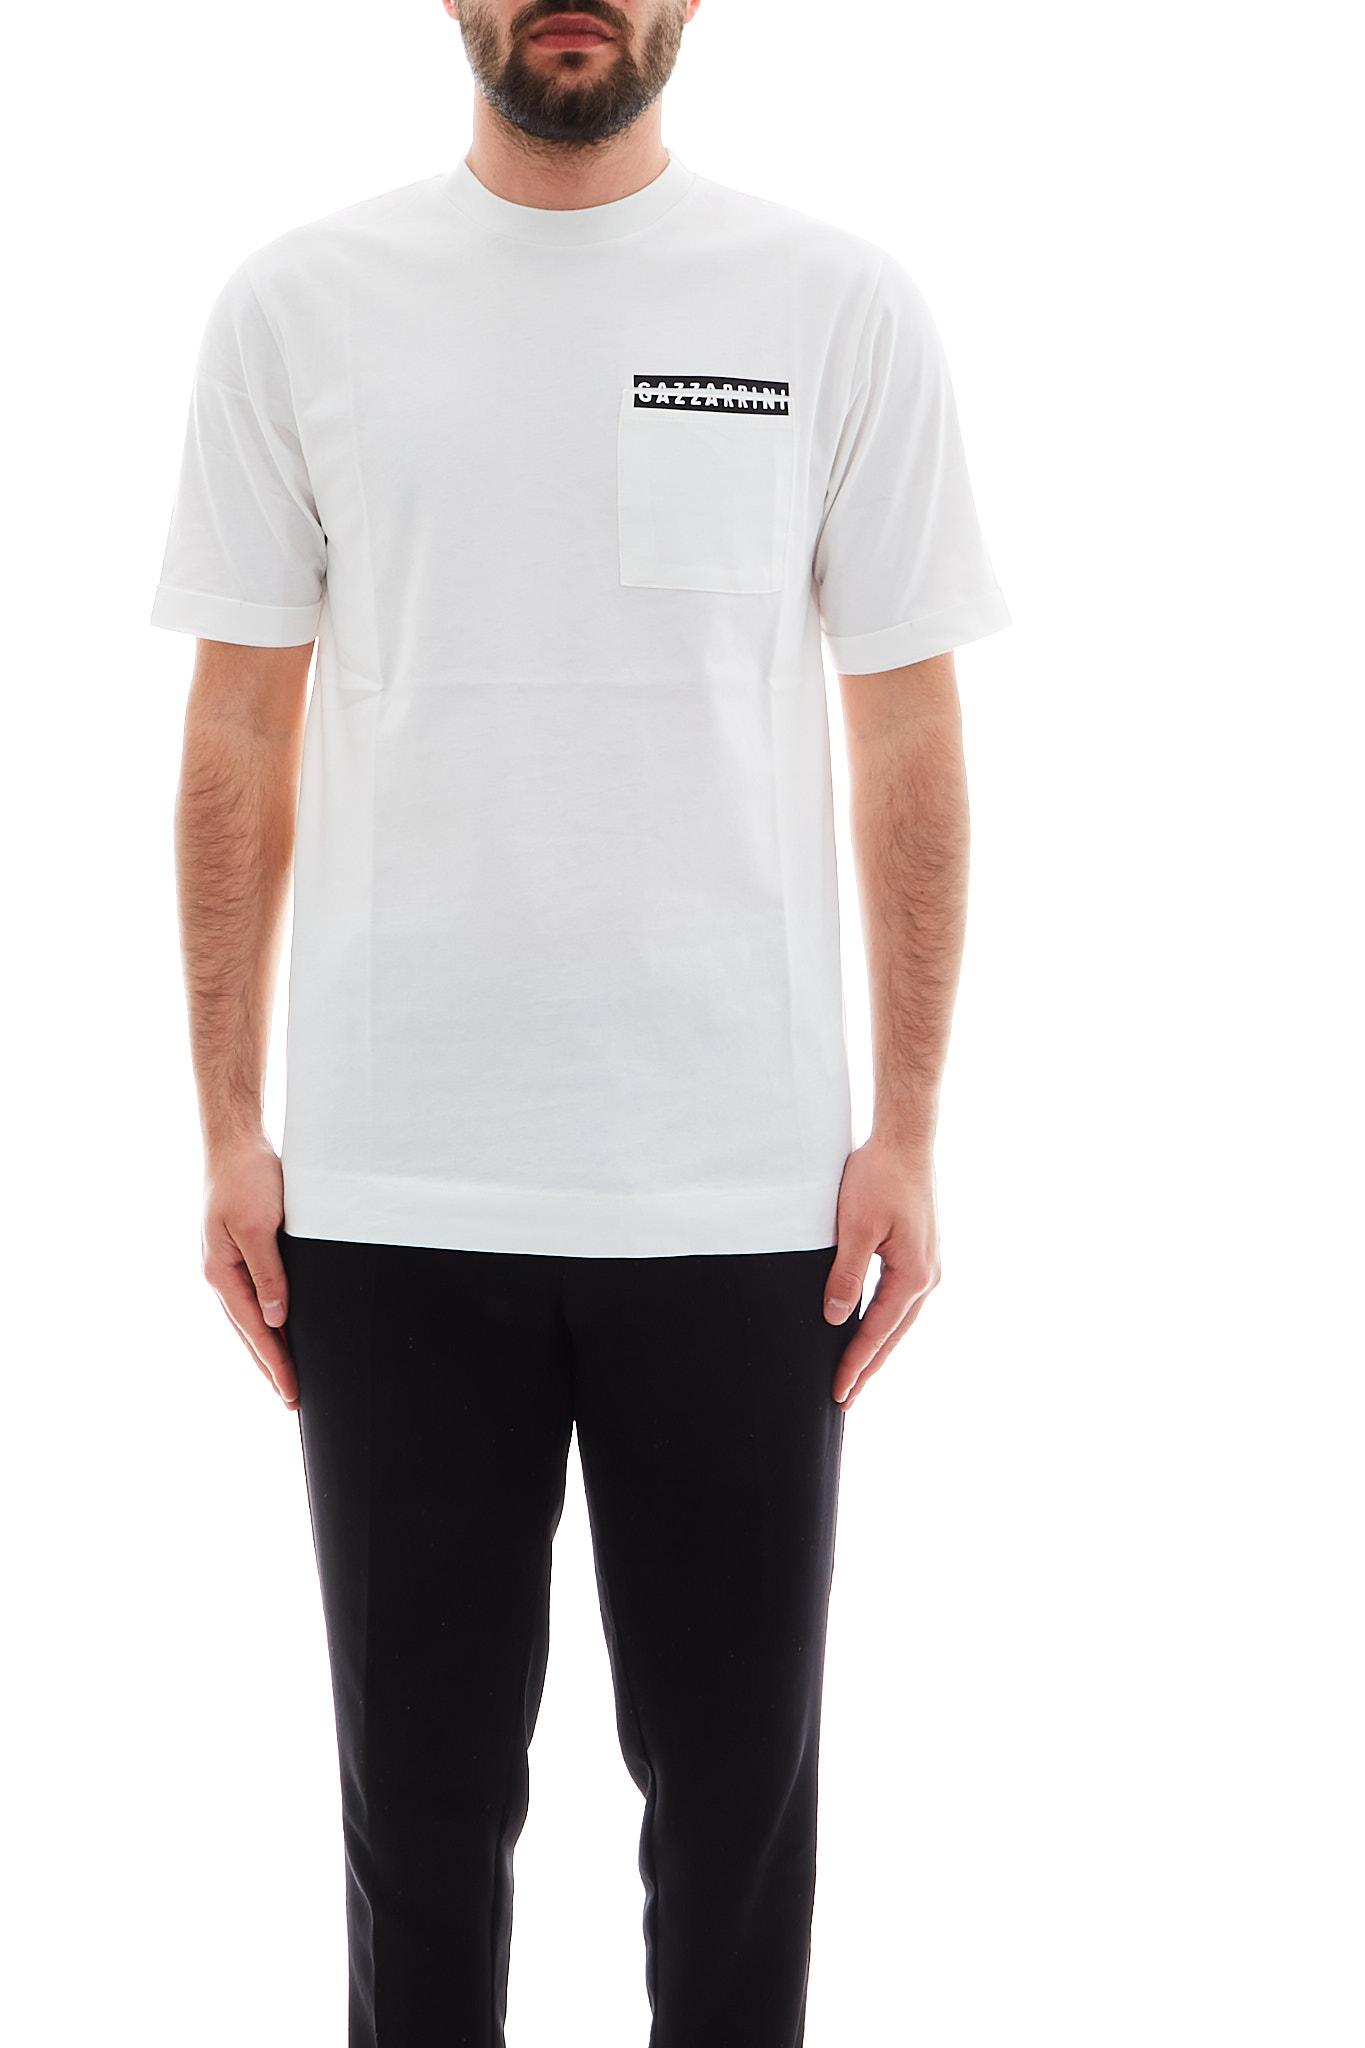 T-shirt Gazzarrini GAZZARRINI   T-shirt   TE24GOFF WHITE